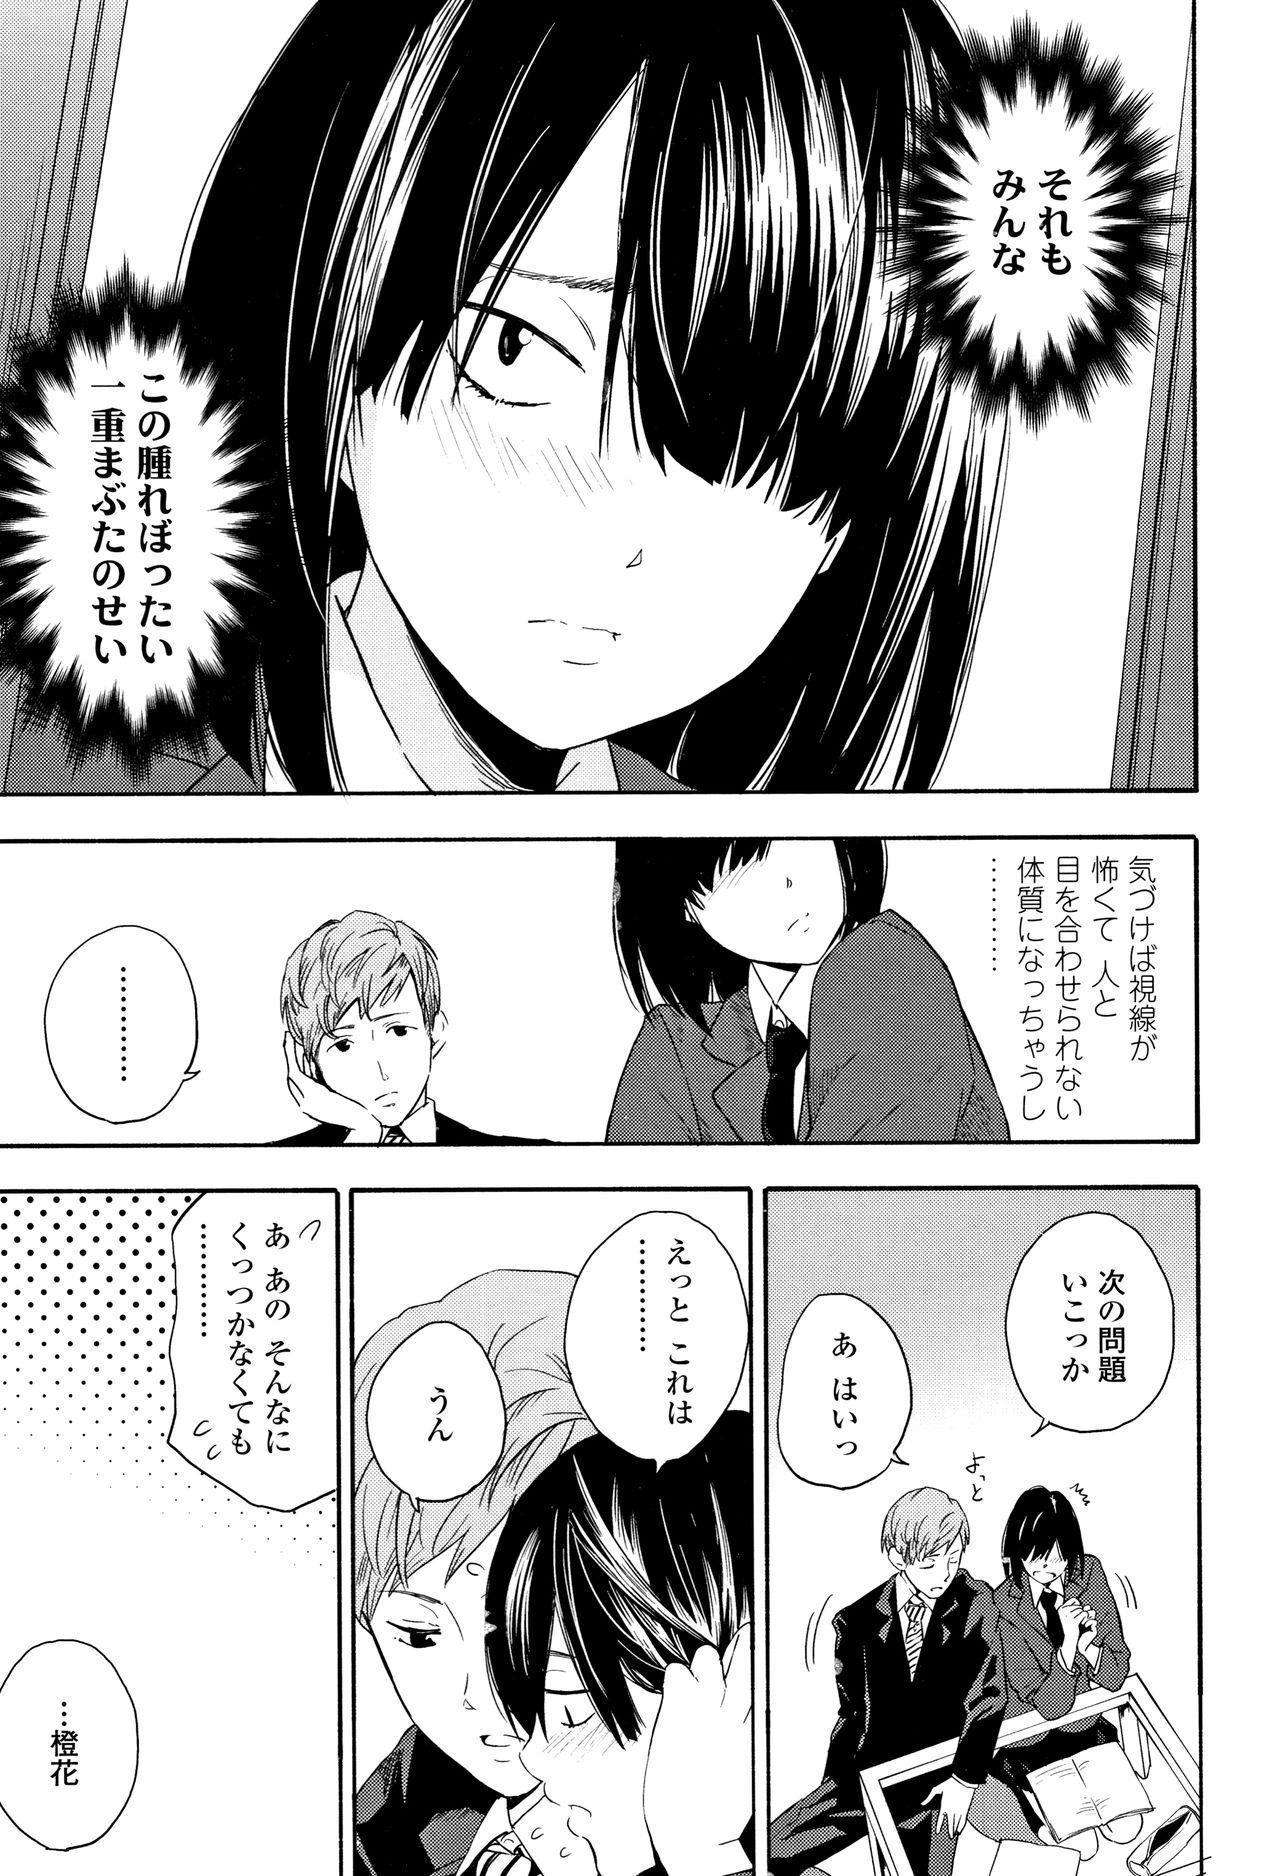 Shishunki no Eros - puberty eros 7